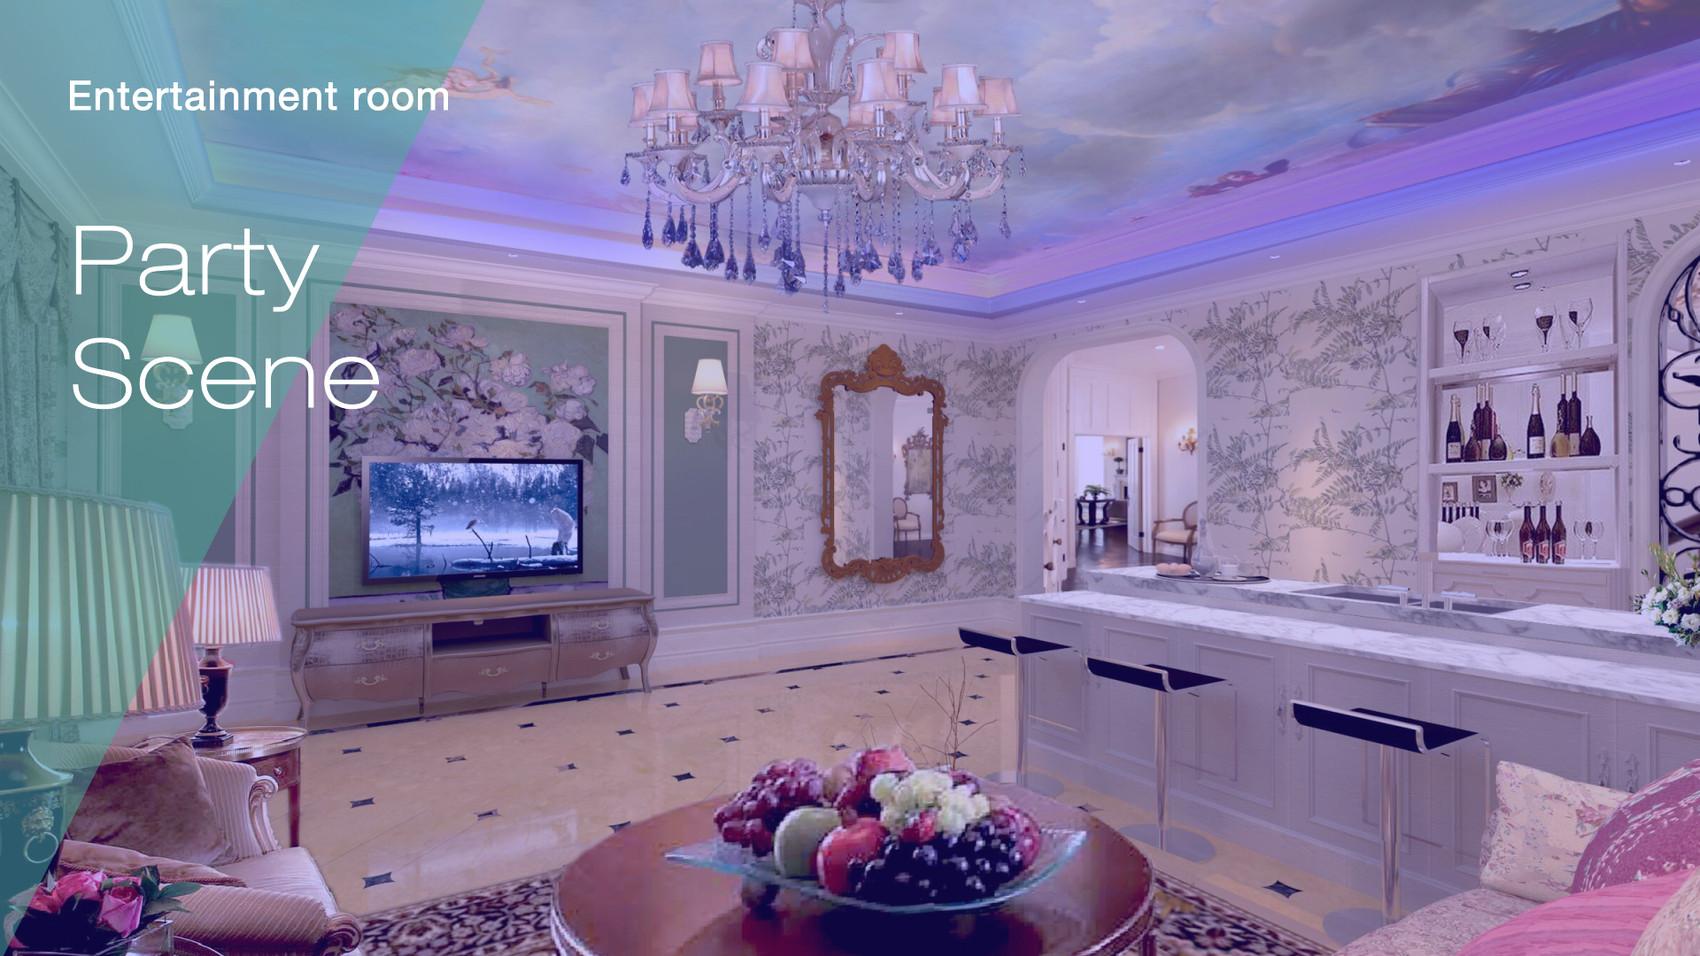 House Entertainment room 3.jpg